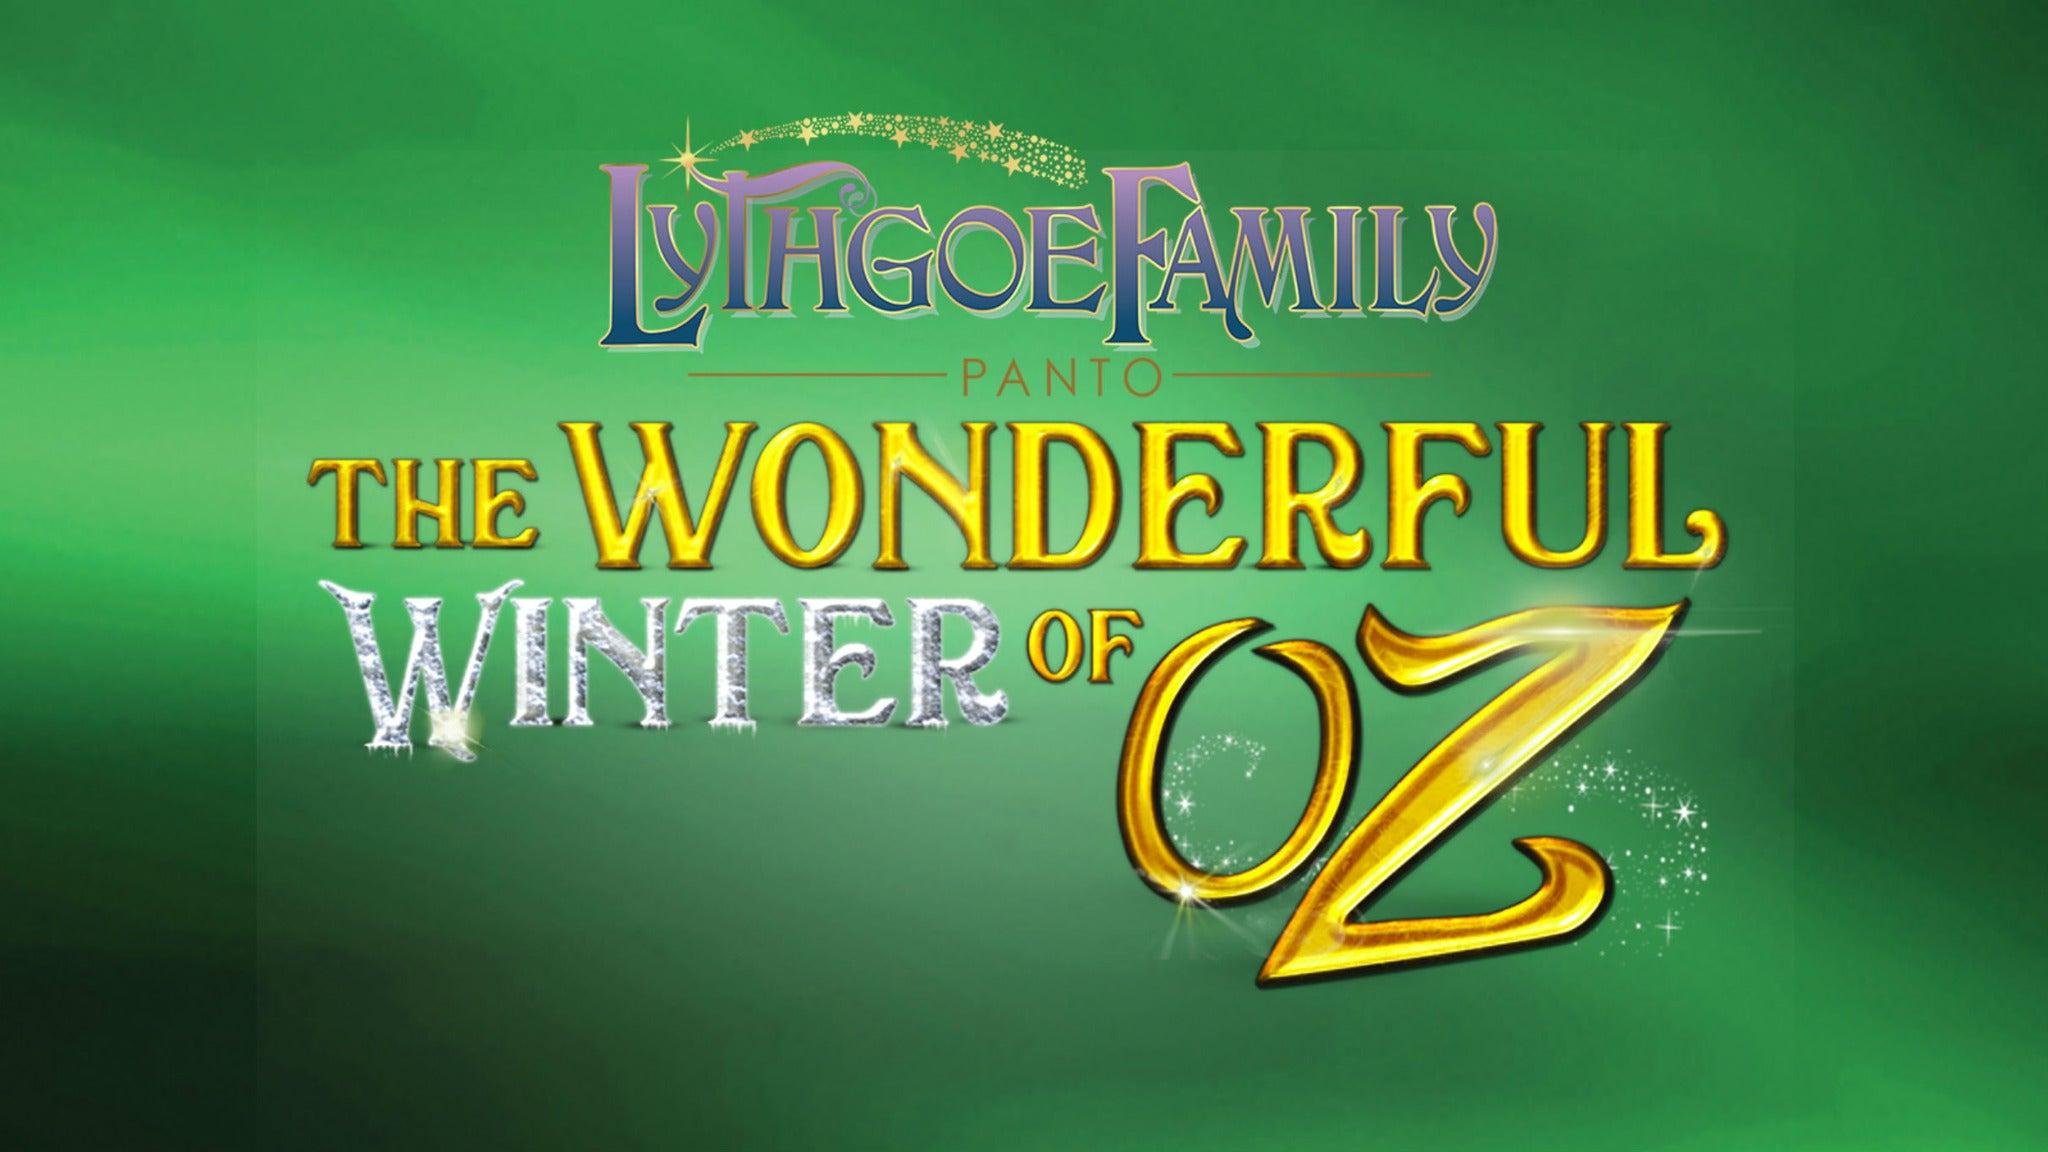 Lythgoe Family Panto's The Wonderful Winter of Oz